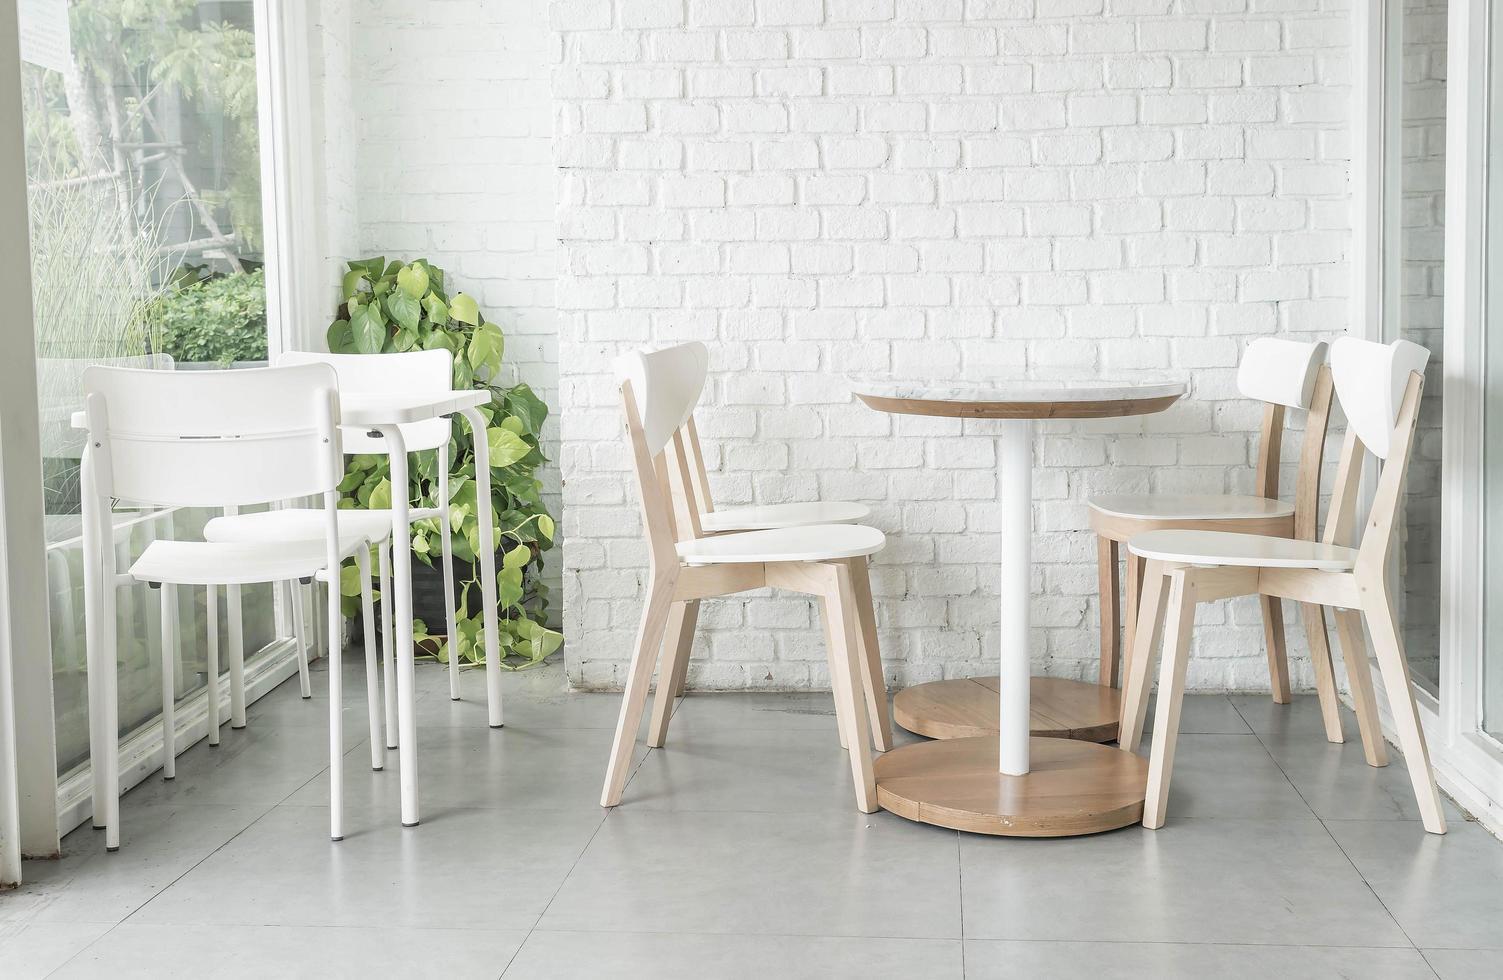 chaises et tables blanches photo